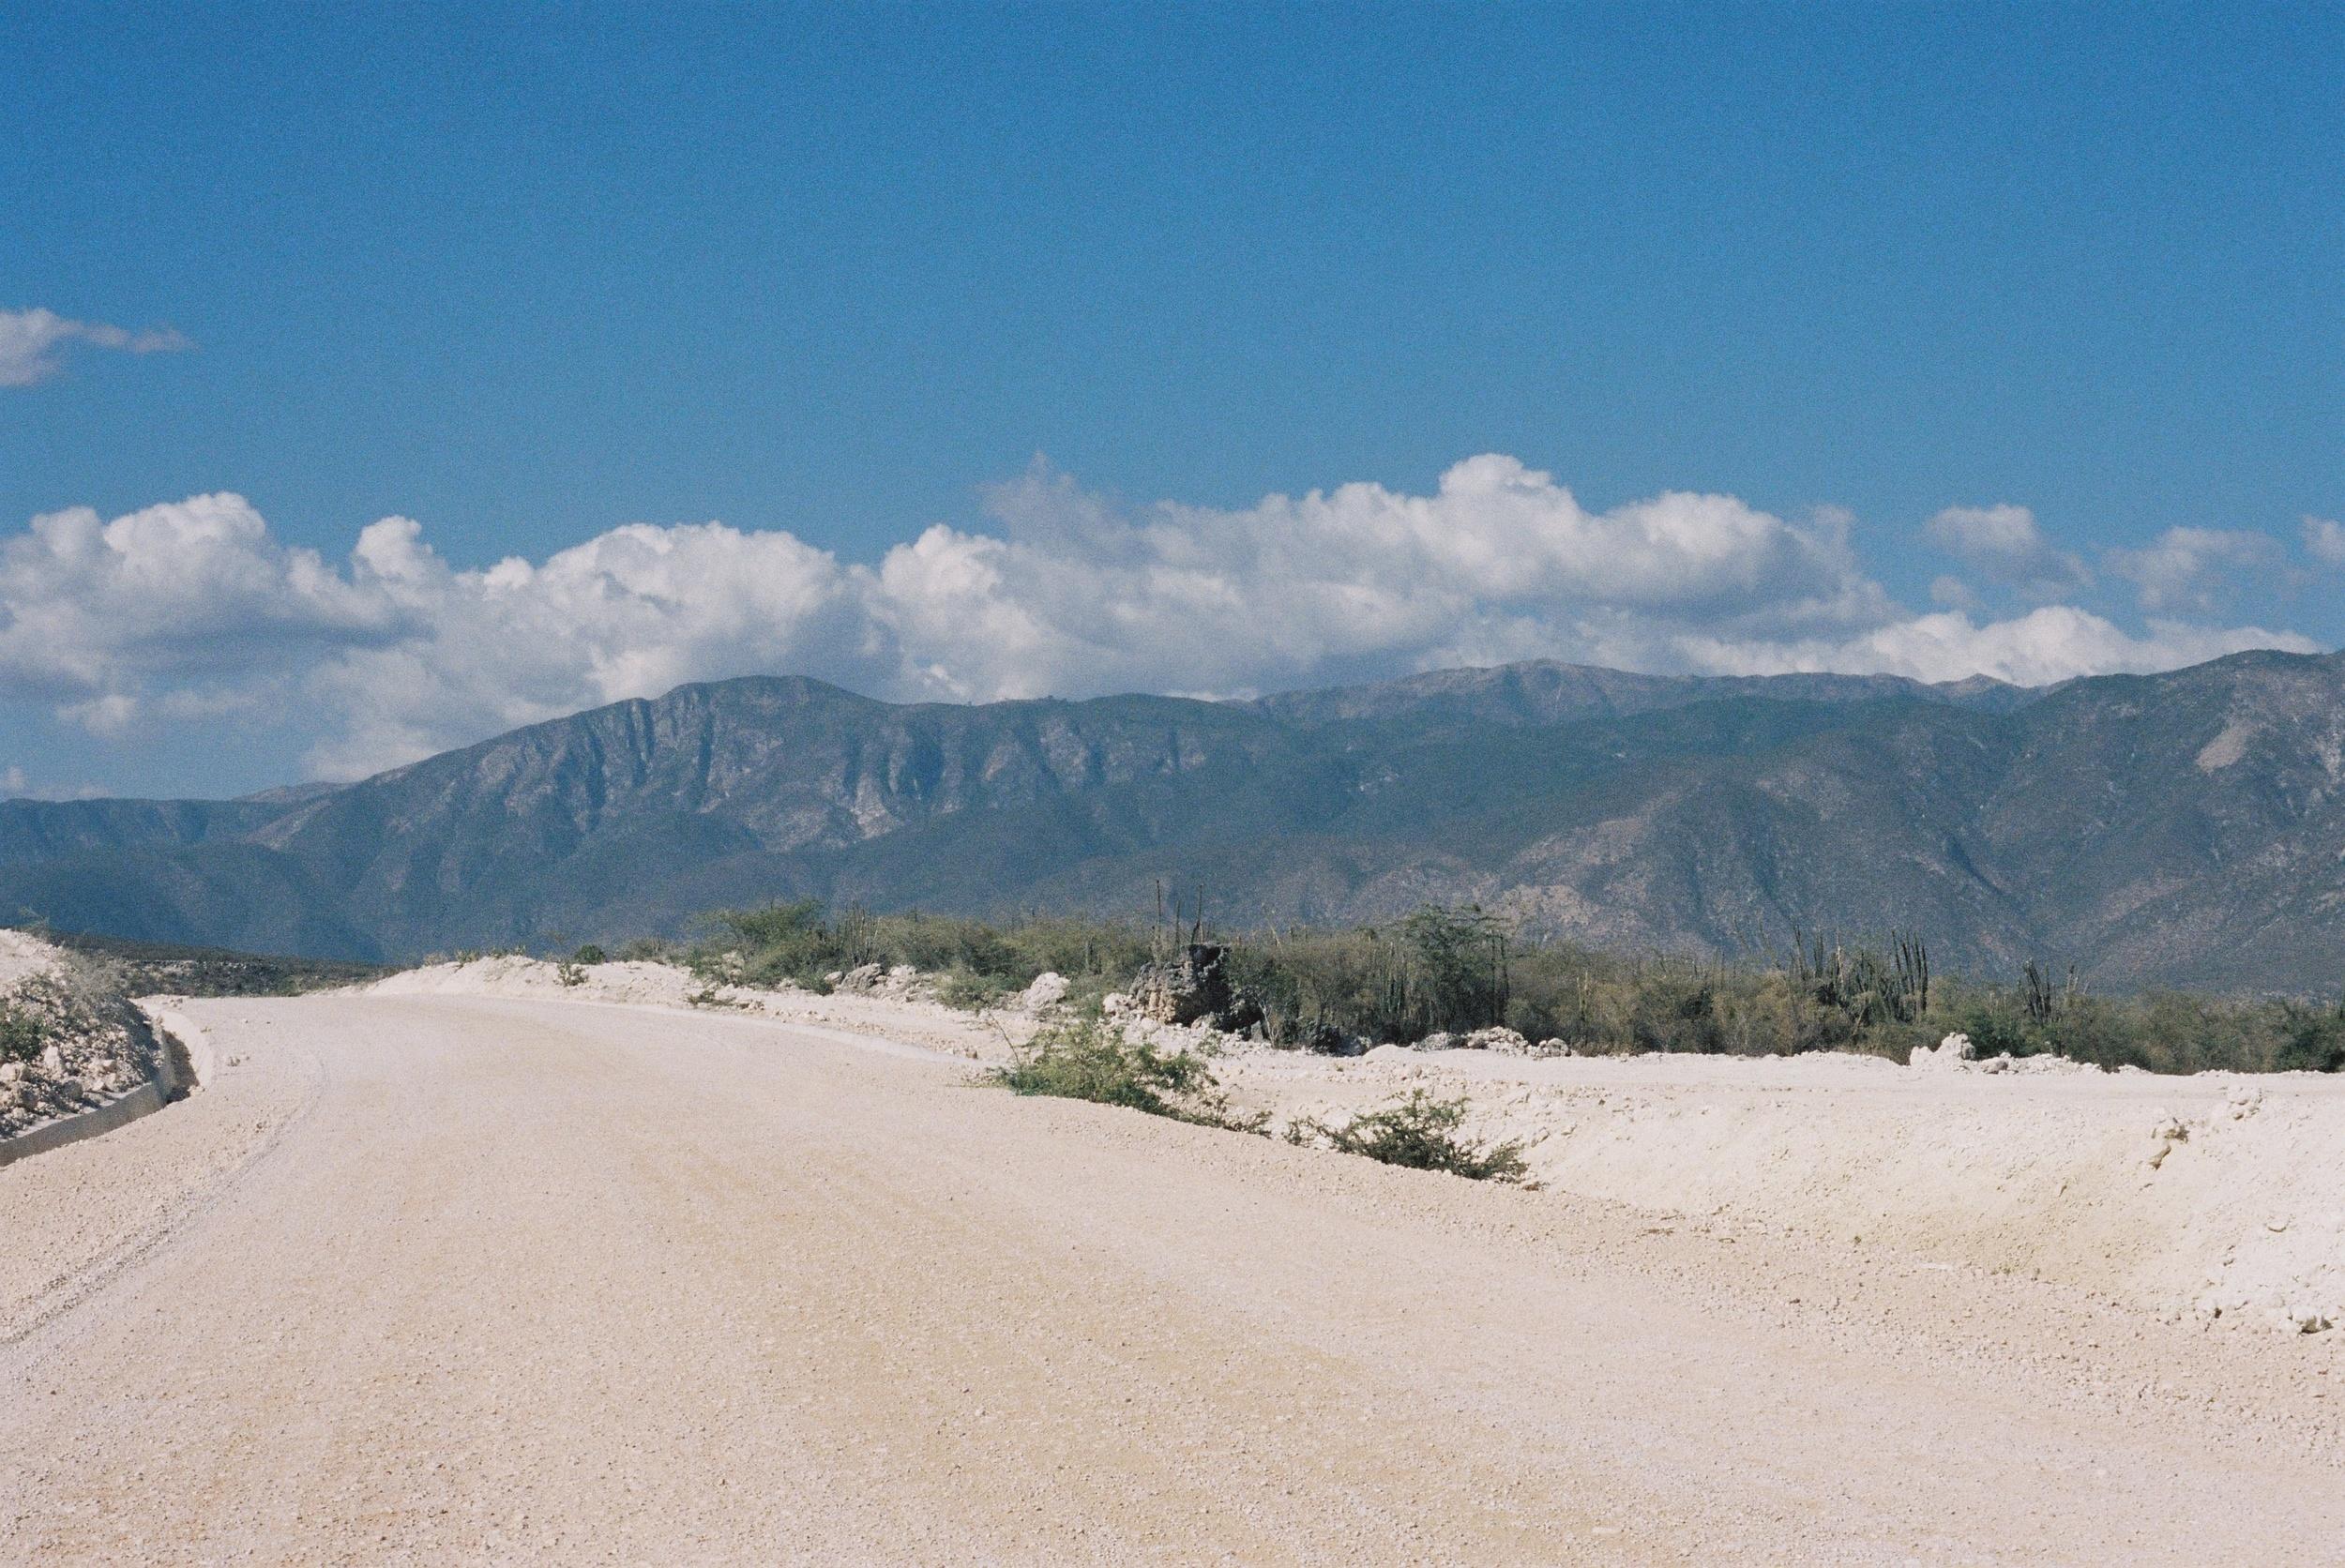 dominican-replublic-haitian-border